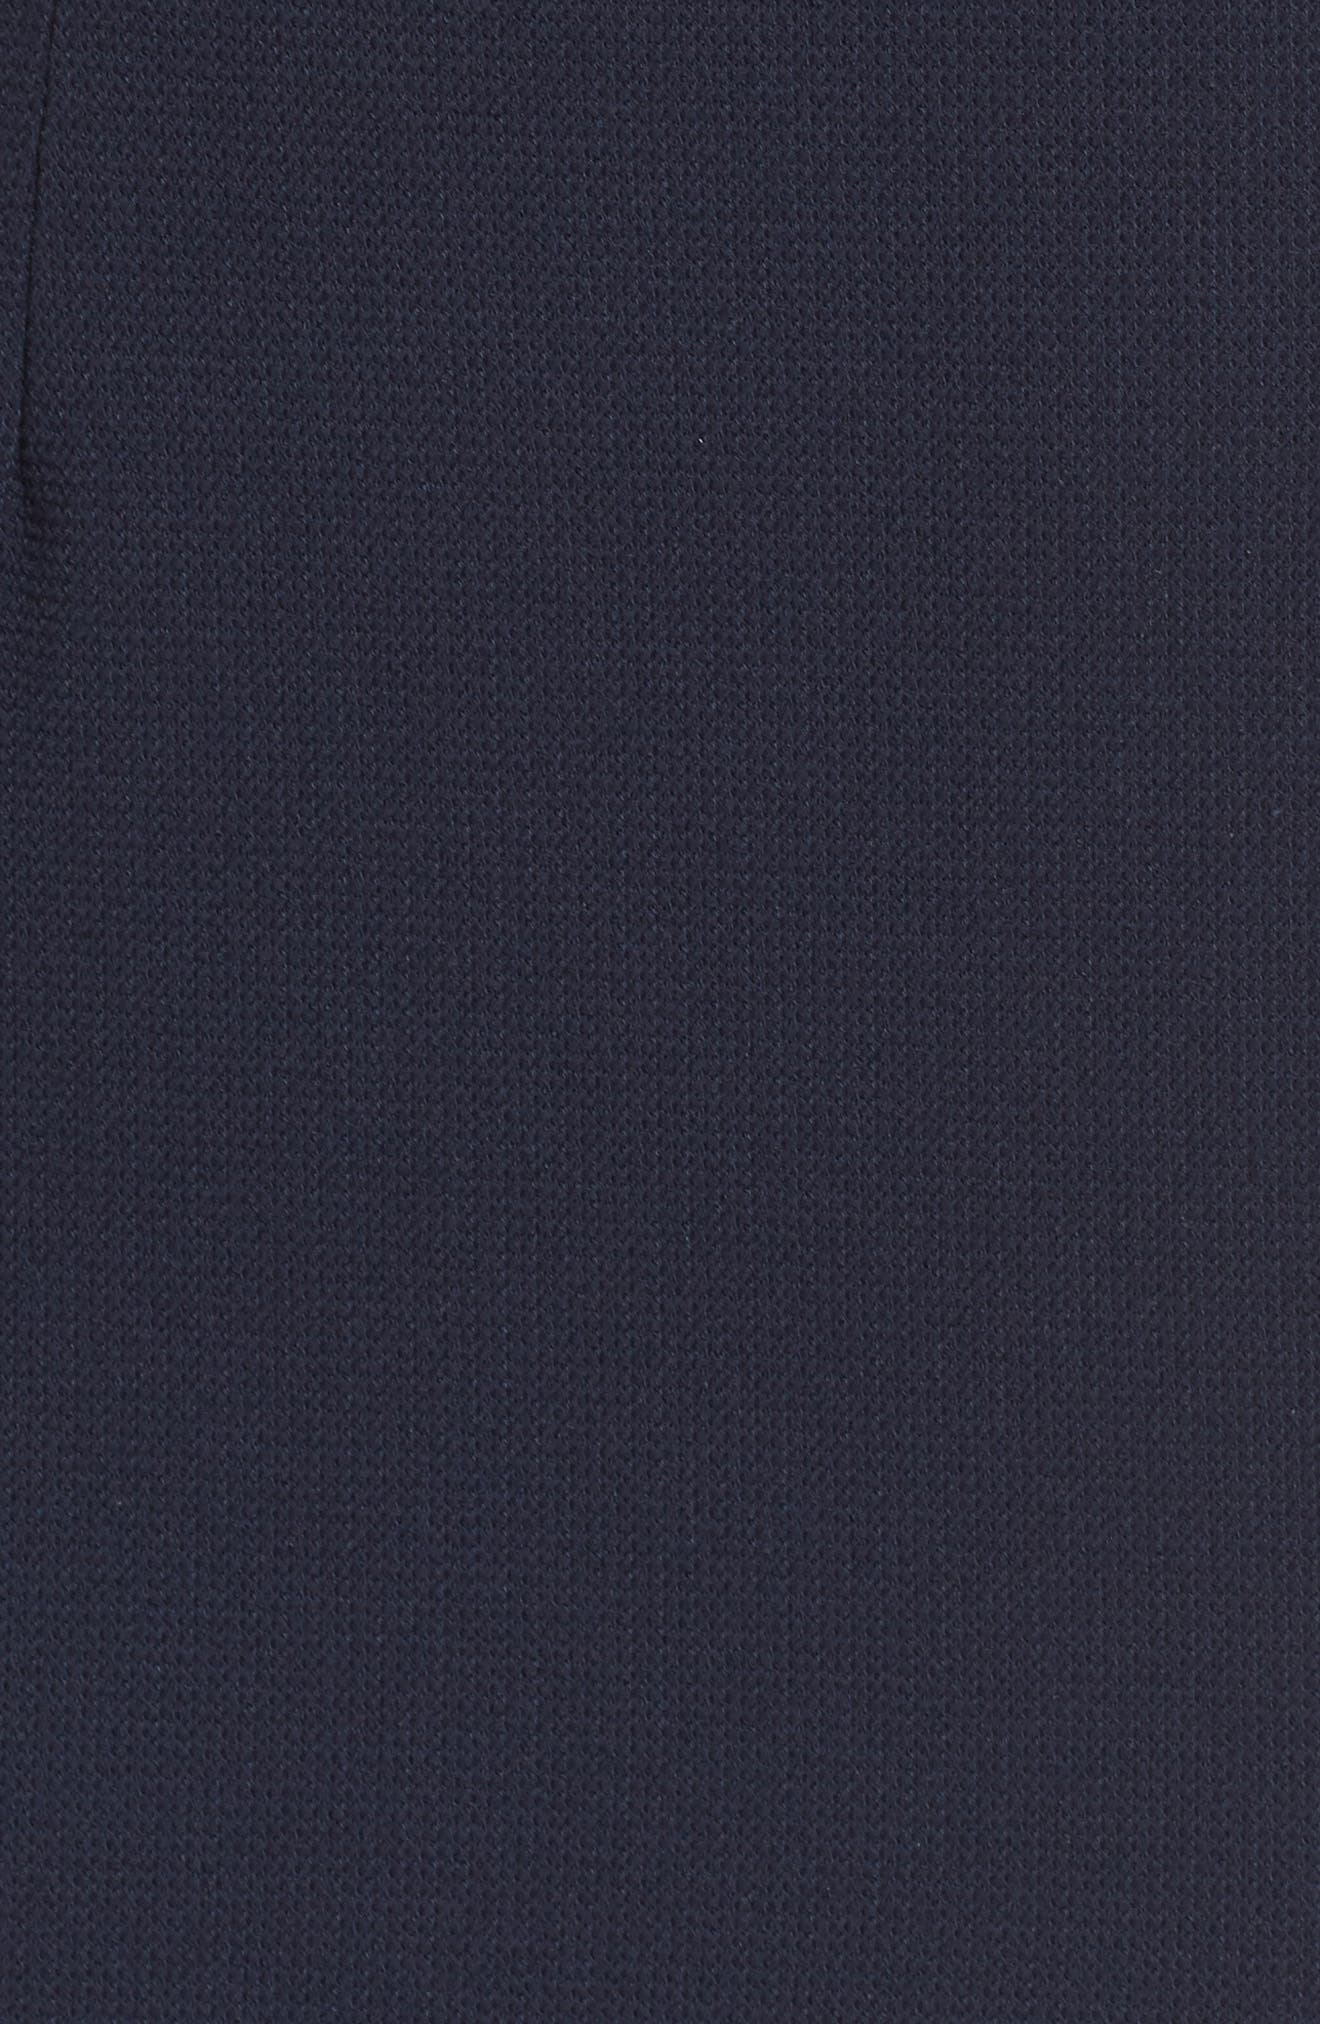 Structured Knit Asymmetrical Trumpet Midi Dress,                             Alternate thumbnail 5, color,